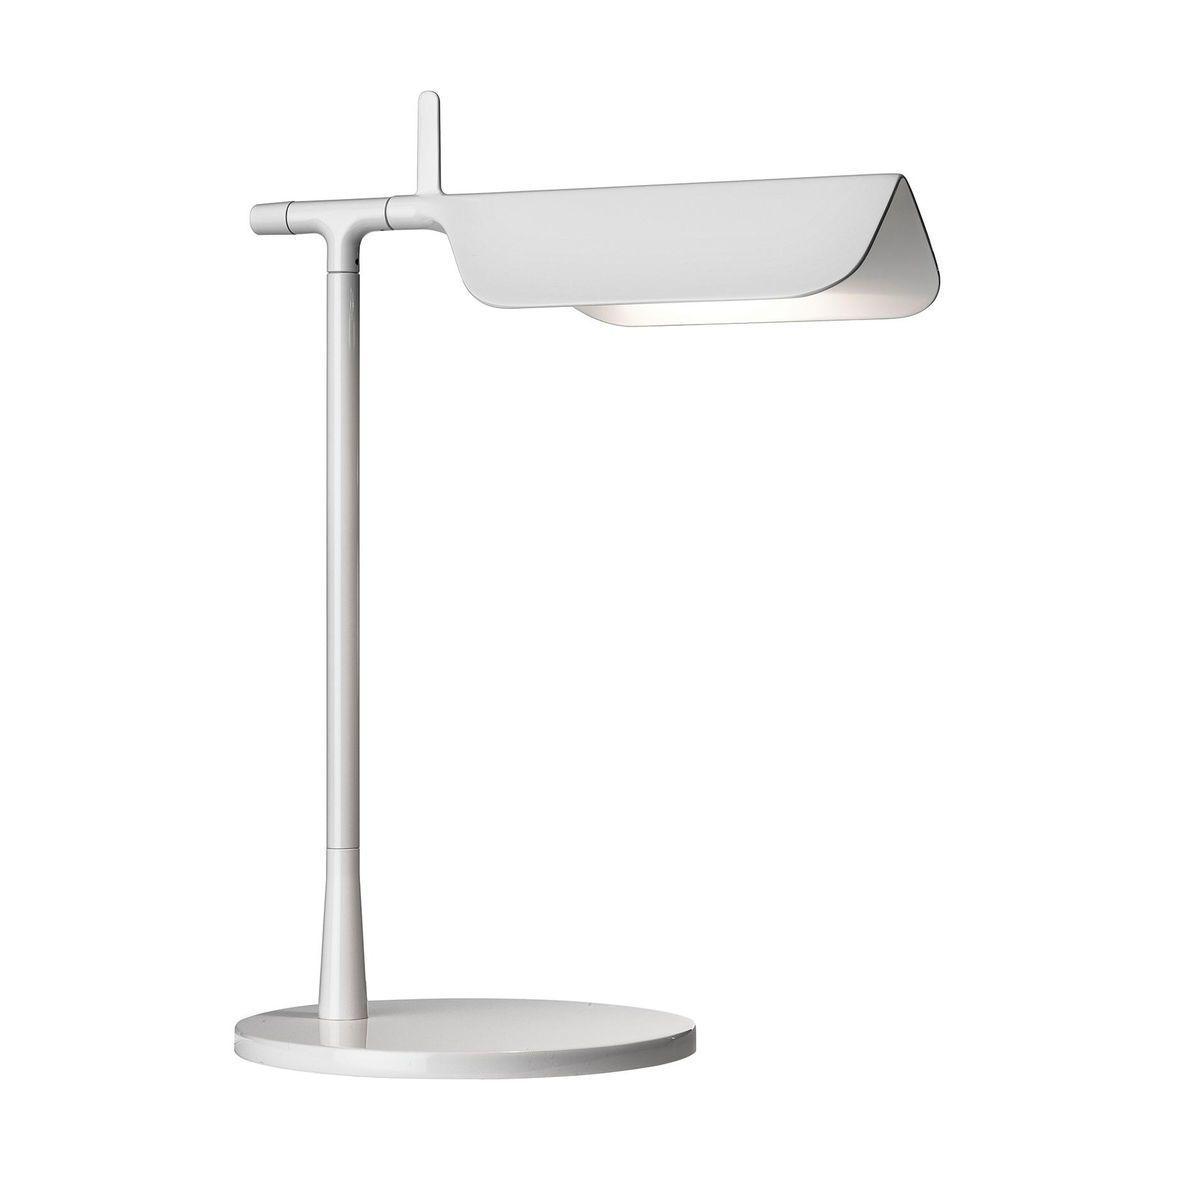 Flos   Tab T LED Table Lamp   White/glossy